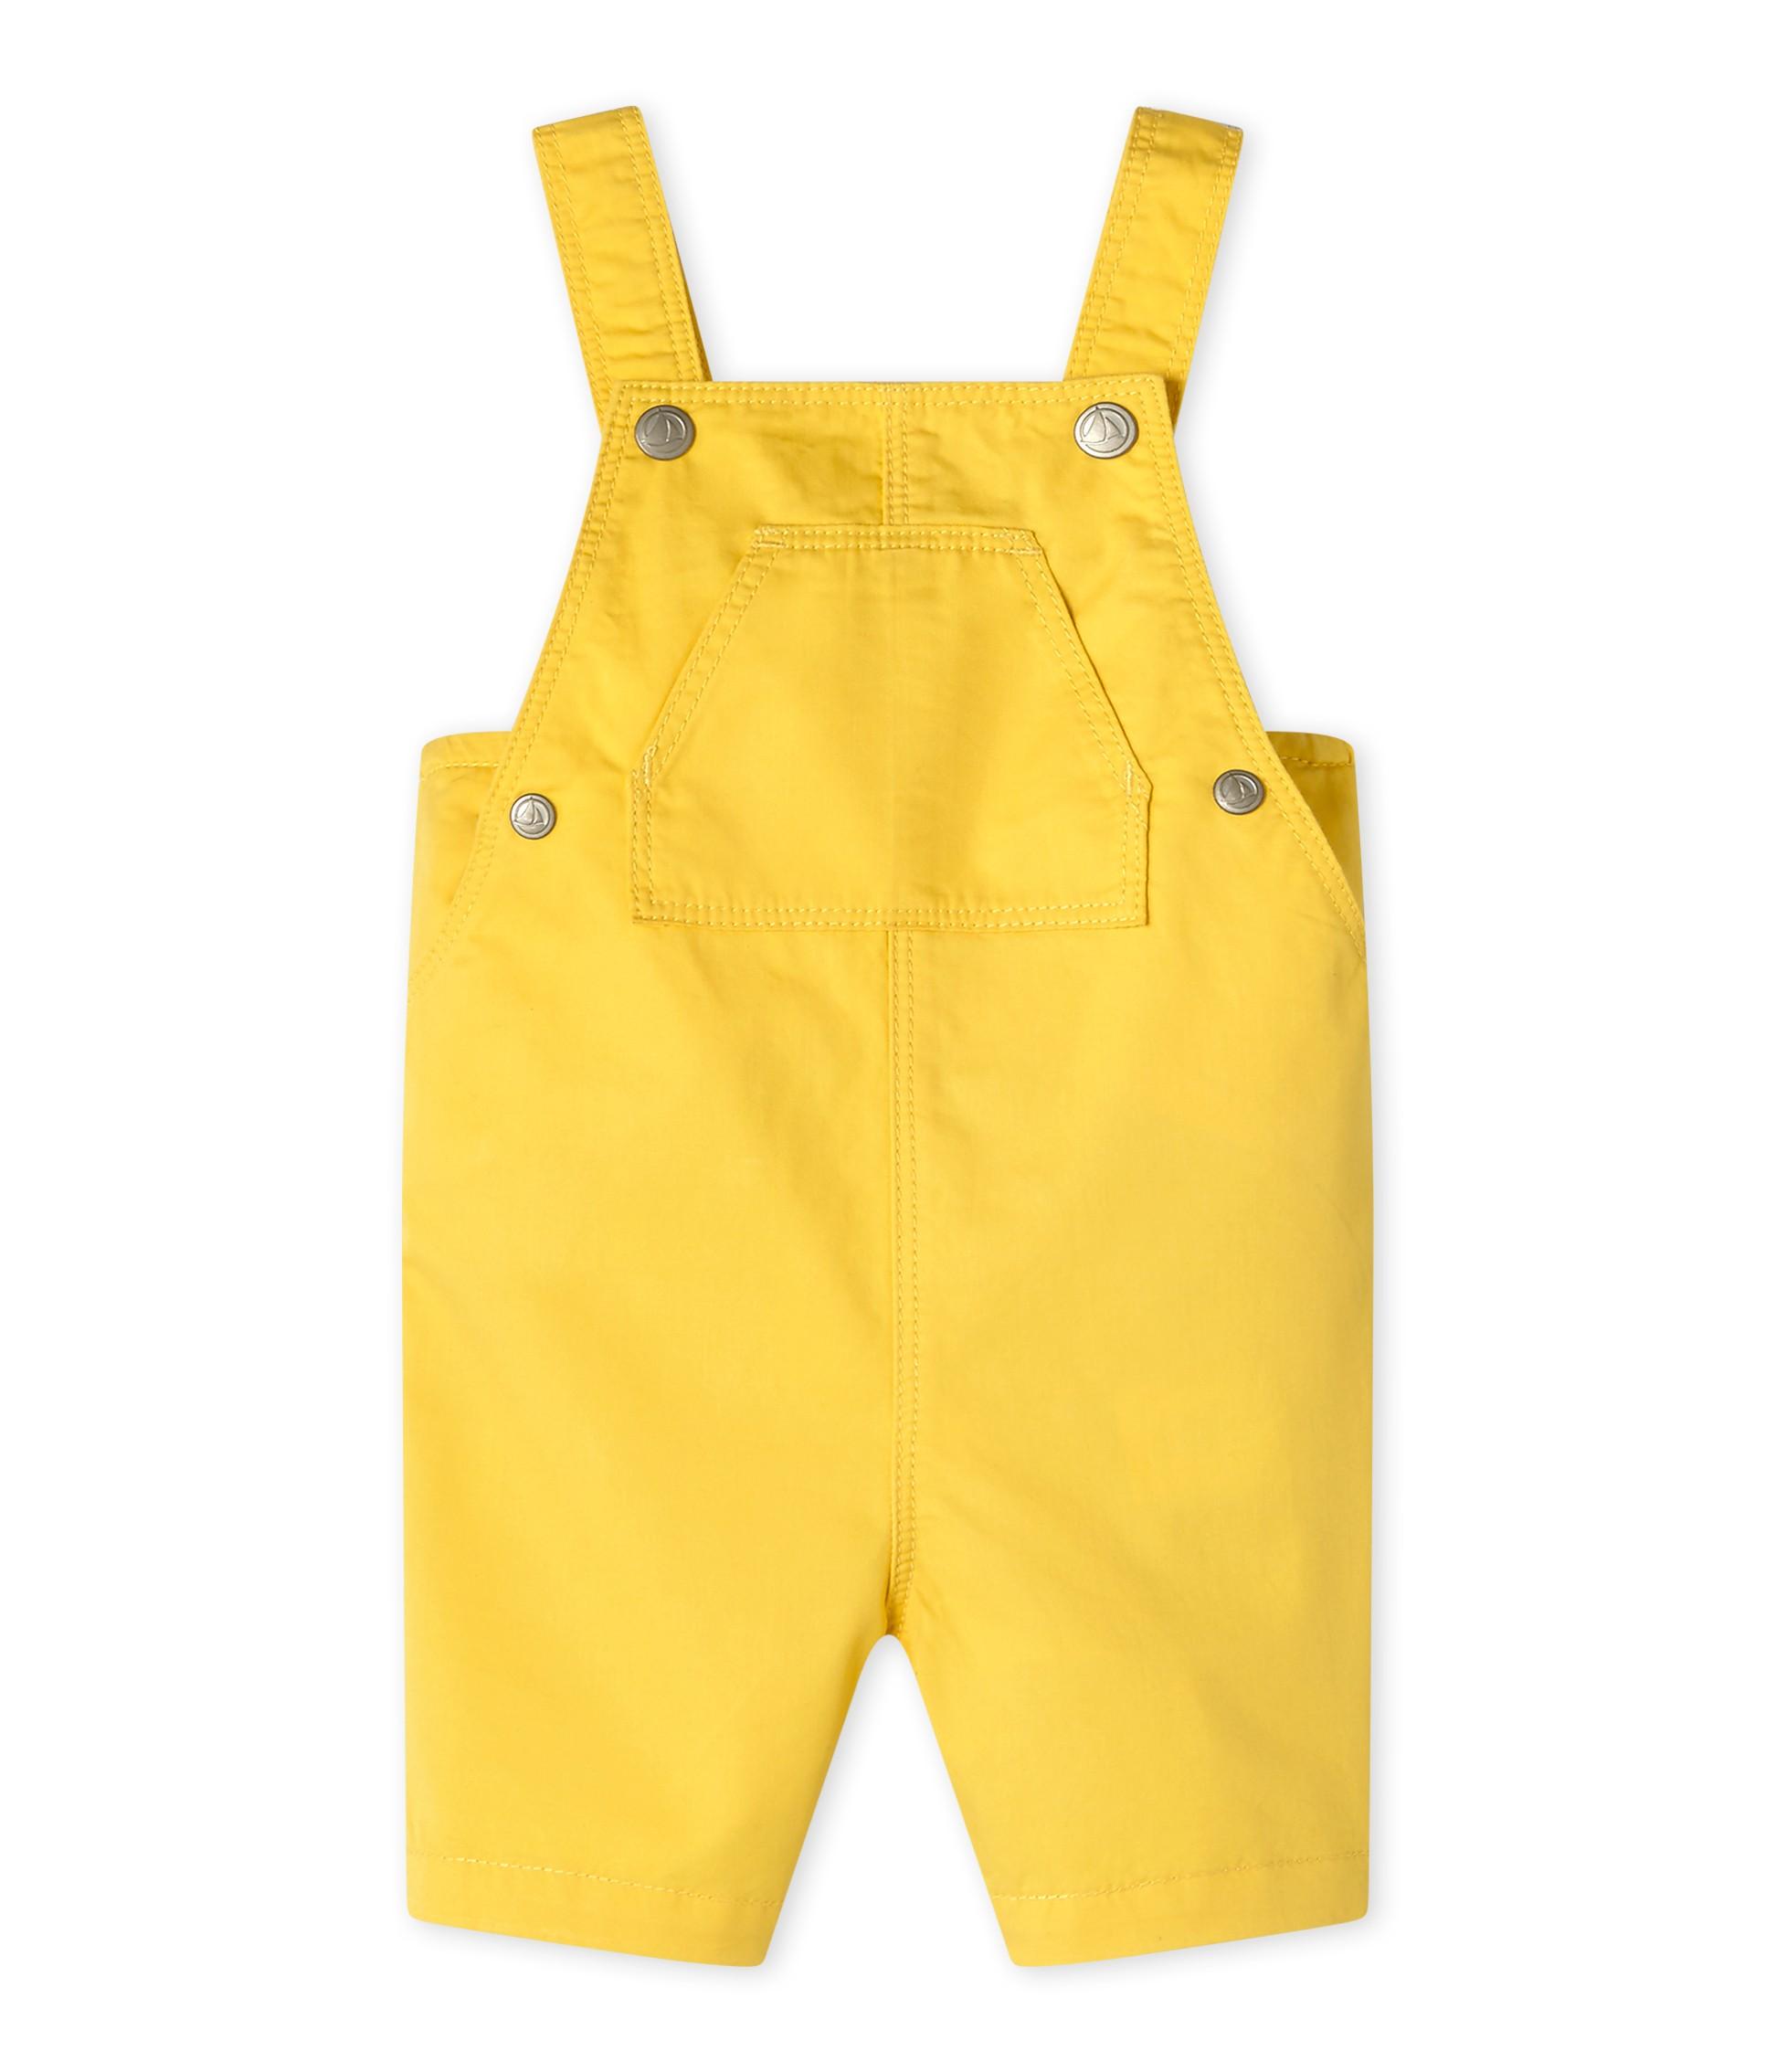 23848930e173 Baby boys  striped short dungarees - petit-bateau.gr